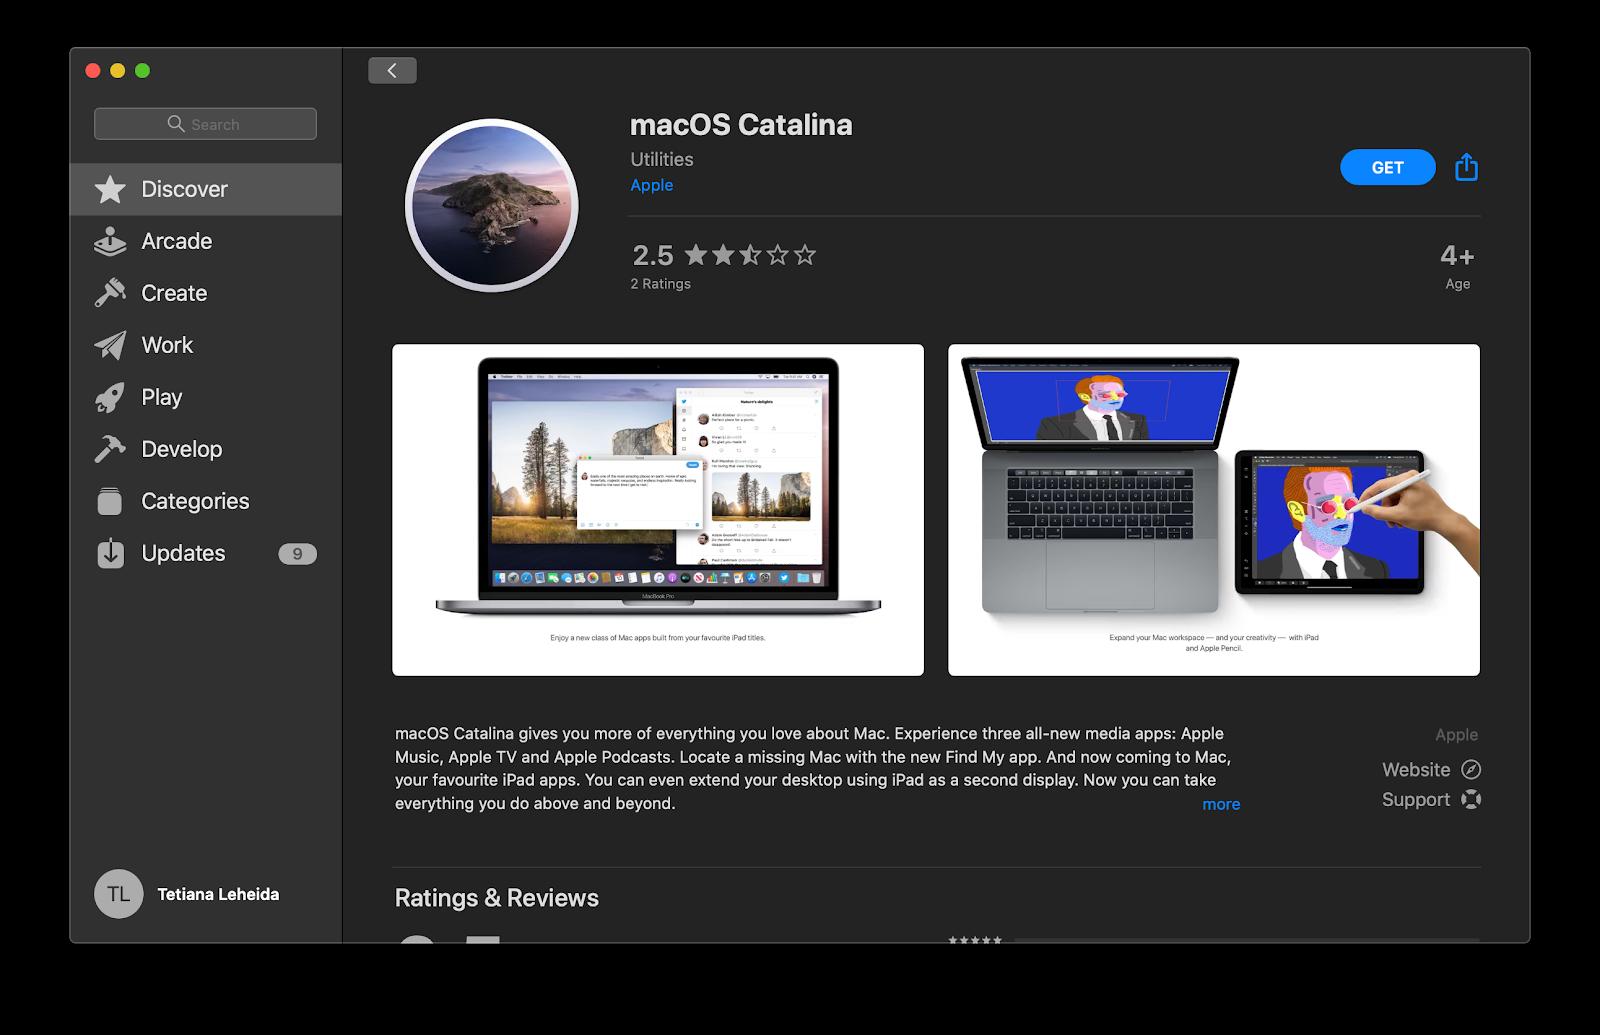 download macOS Catalina App Store